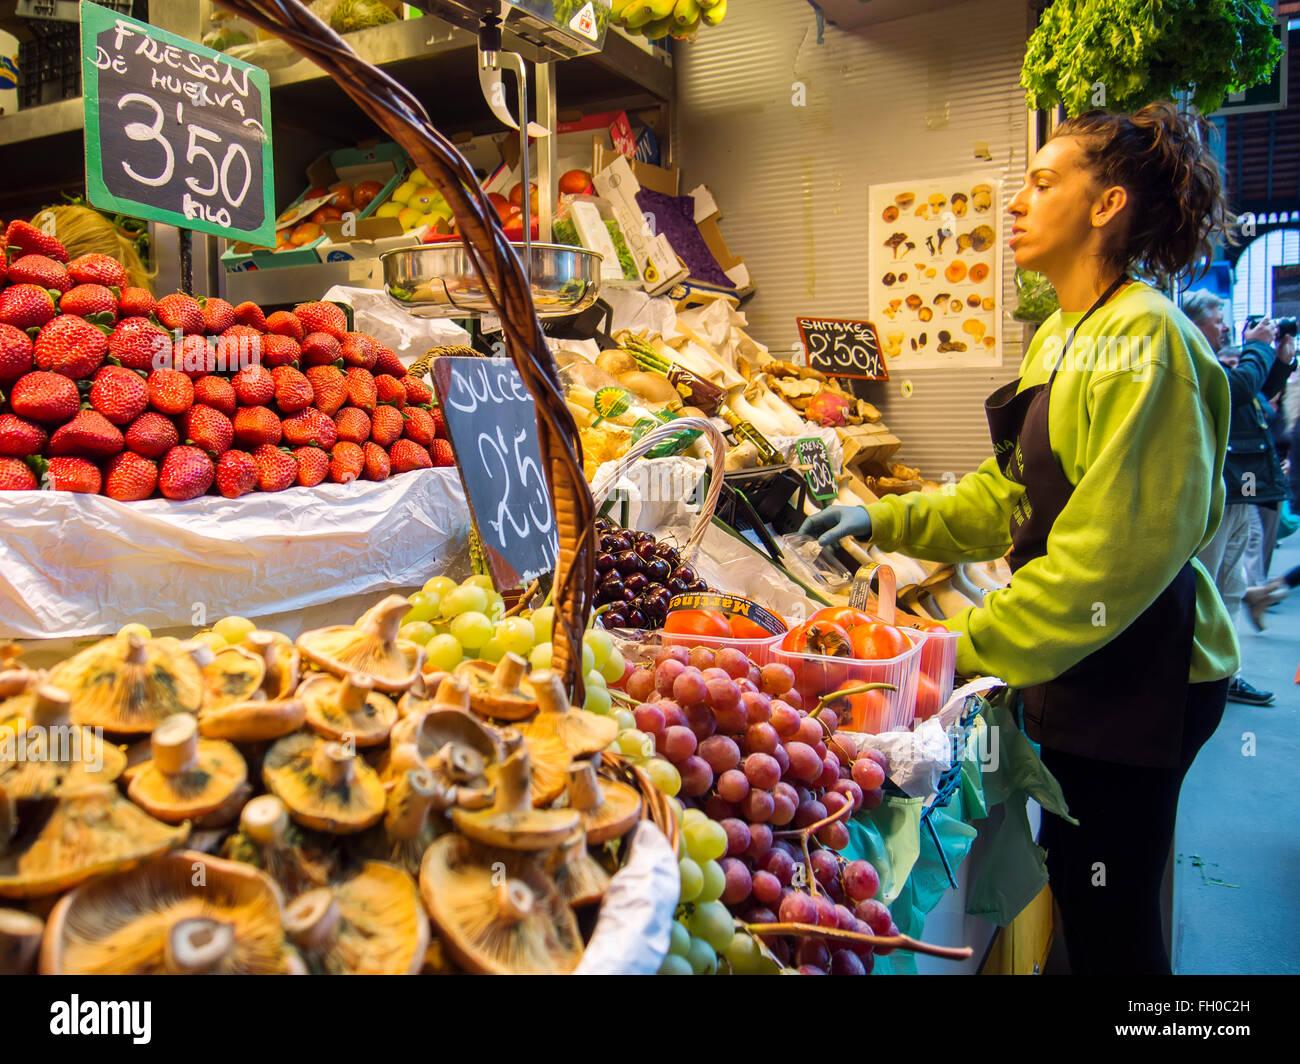 Fresh fruit and vegetables Mercado Atarazanas, spanish market Malaga city, Costa del Sol. Andalusia southern Spain - Stock Image